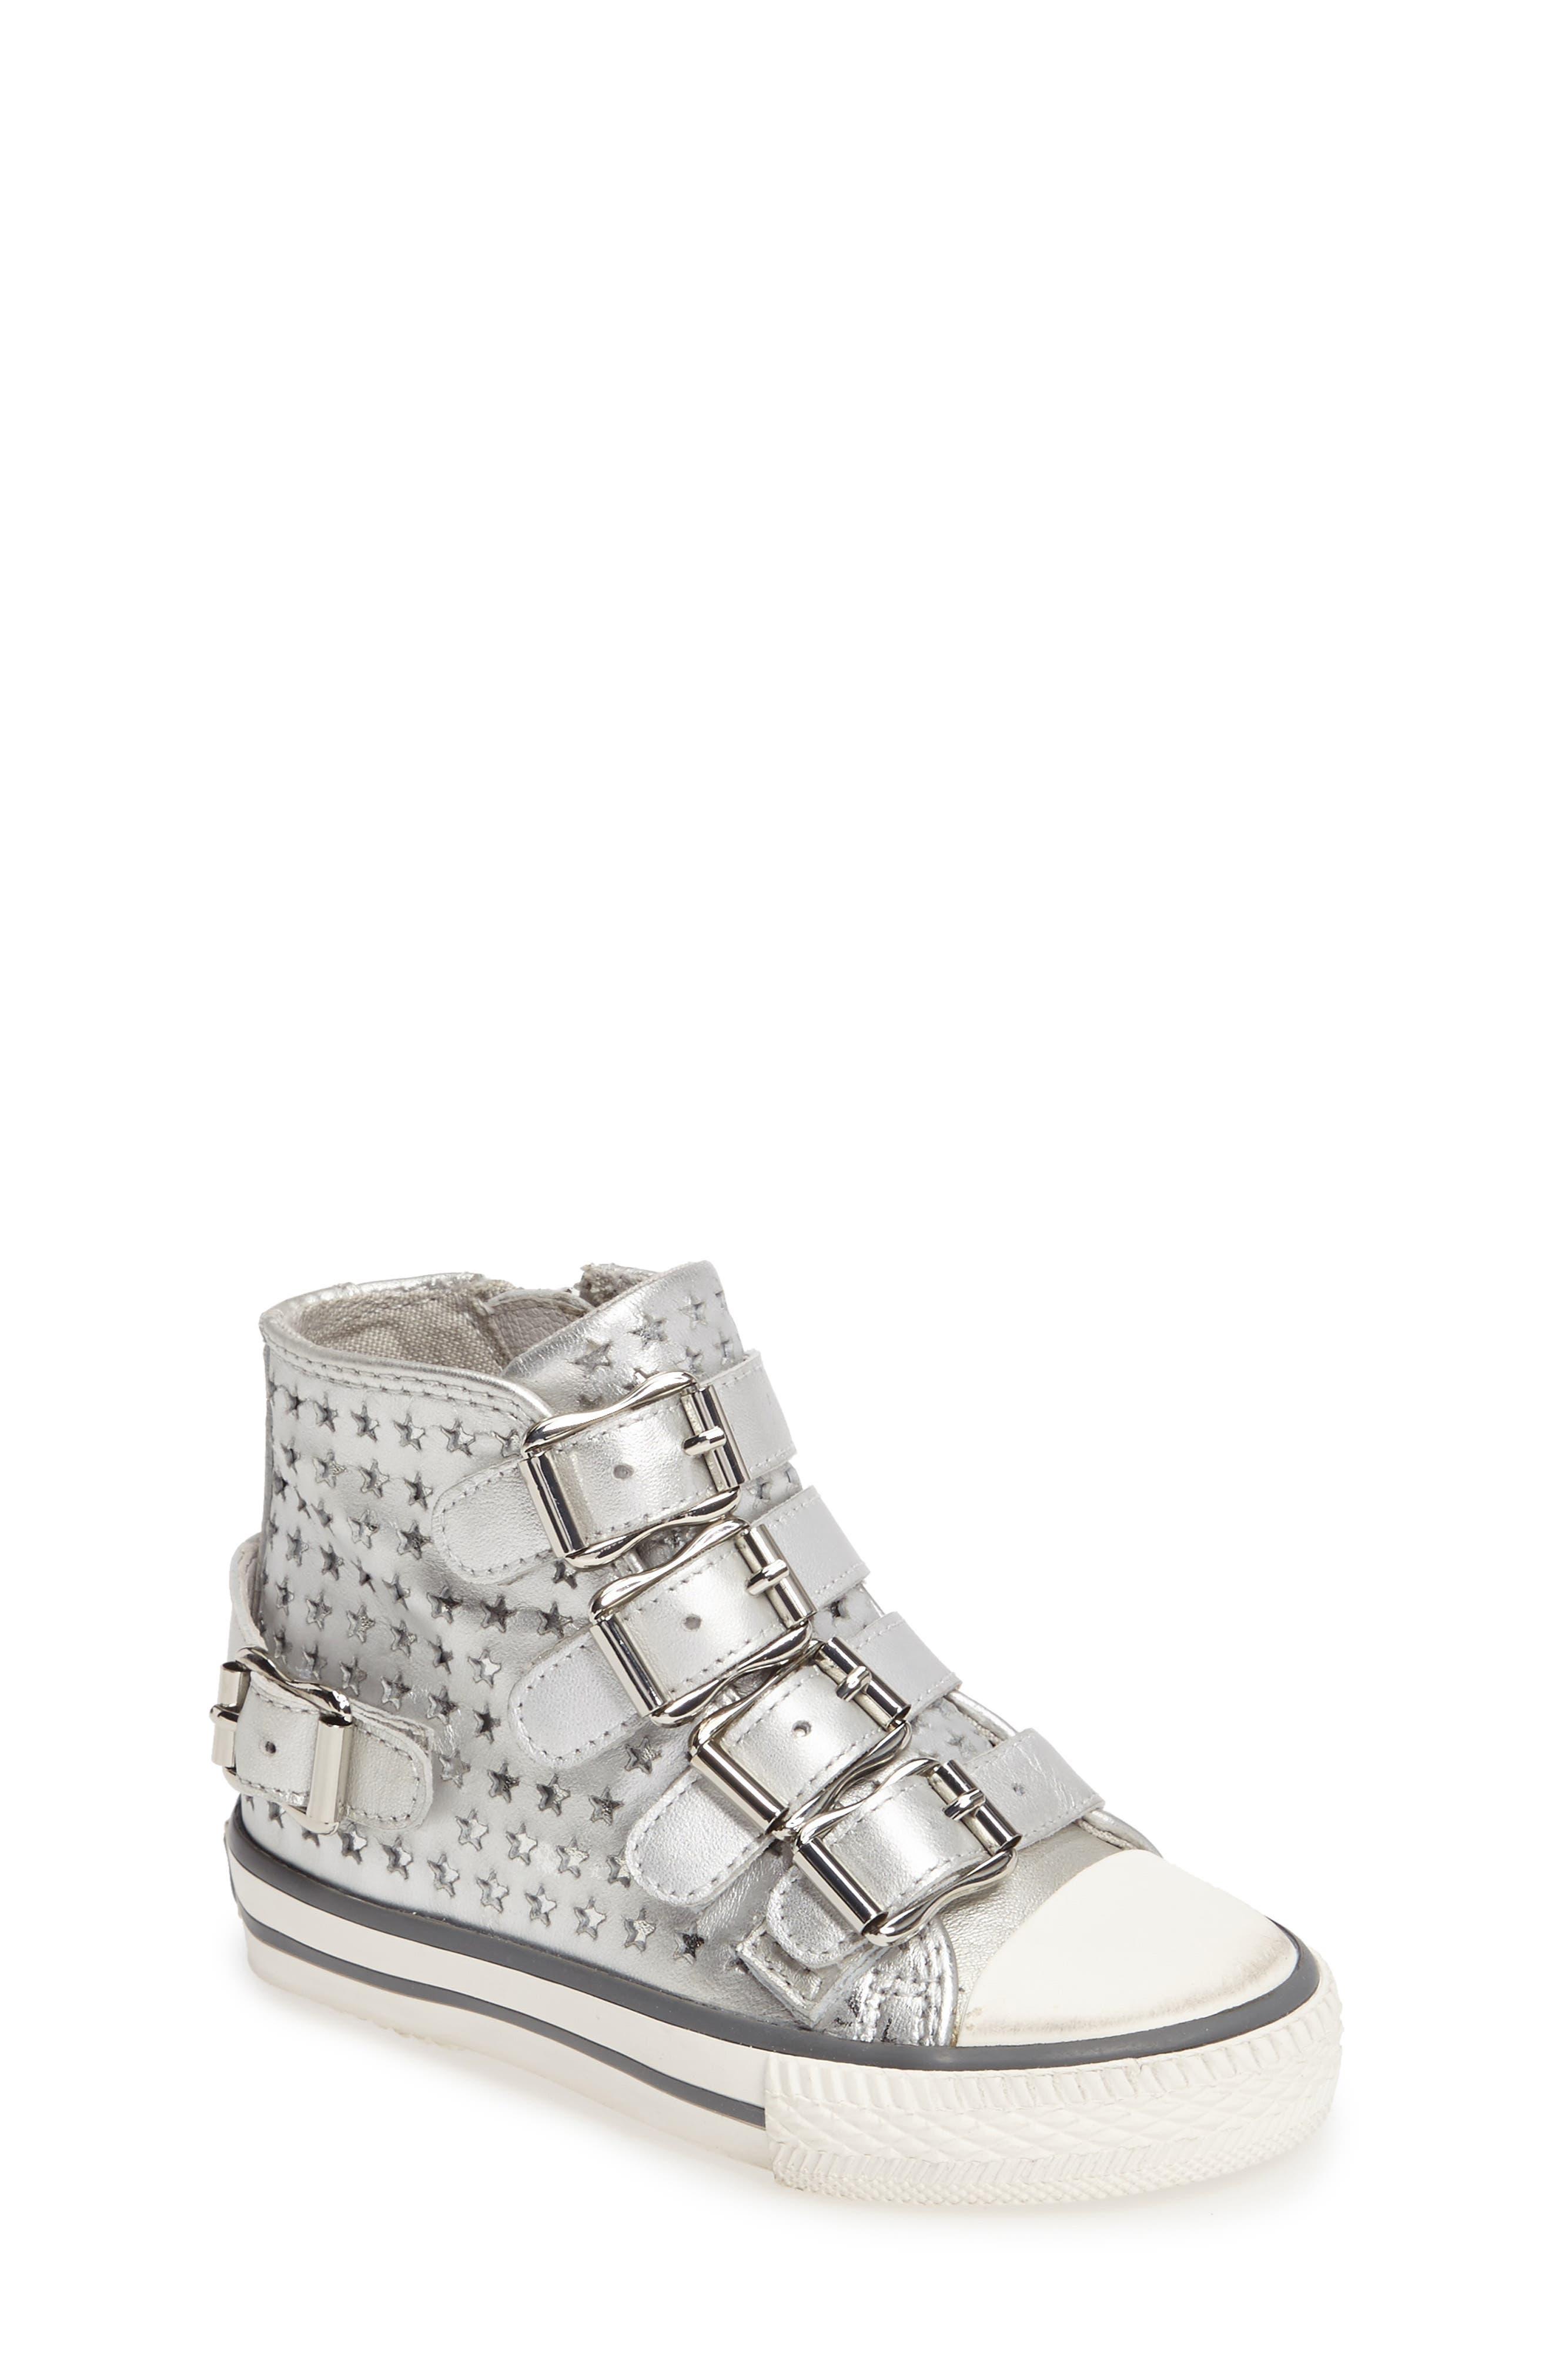 Vava Starboss Buckle Strap High Top Sneaker,                         Main,                         color, 041